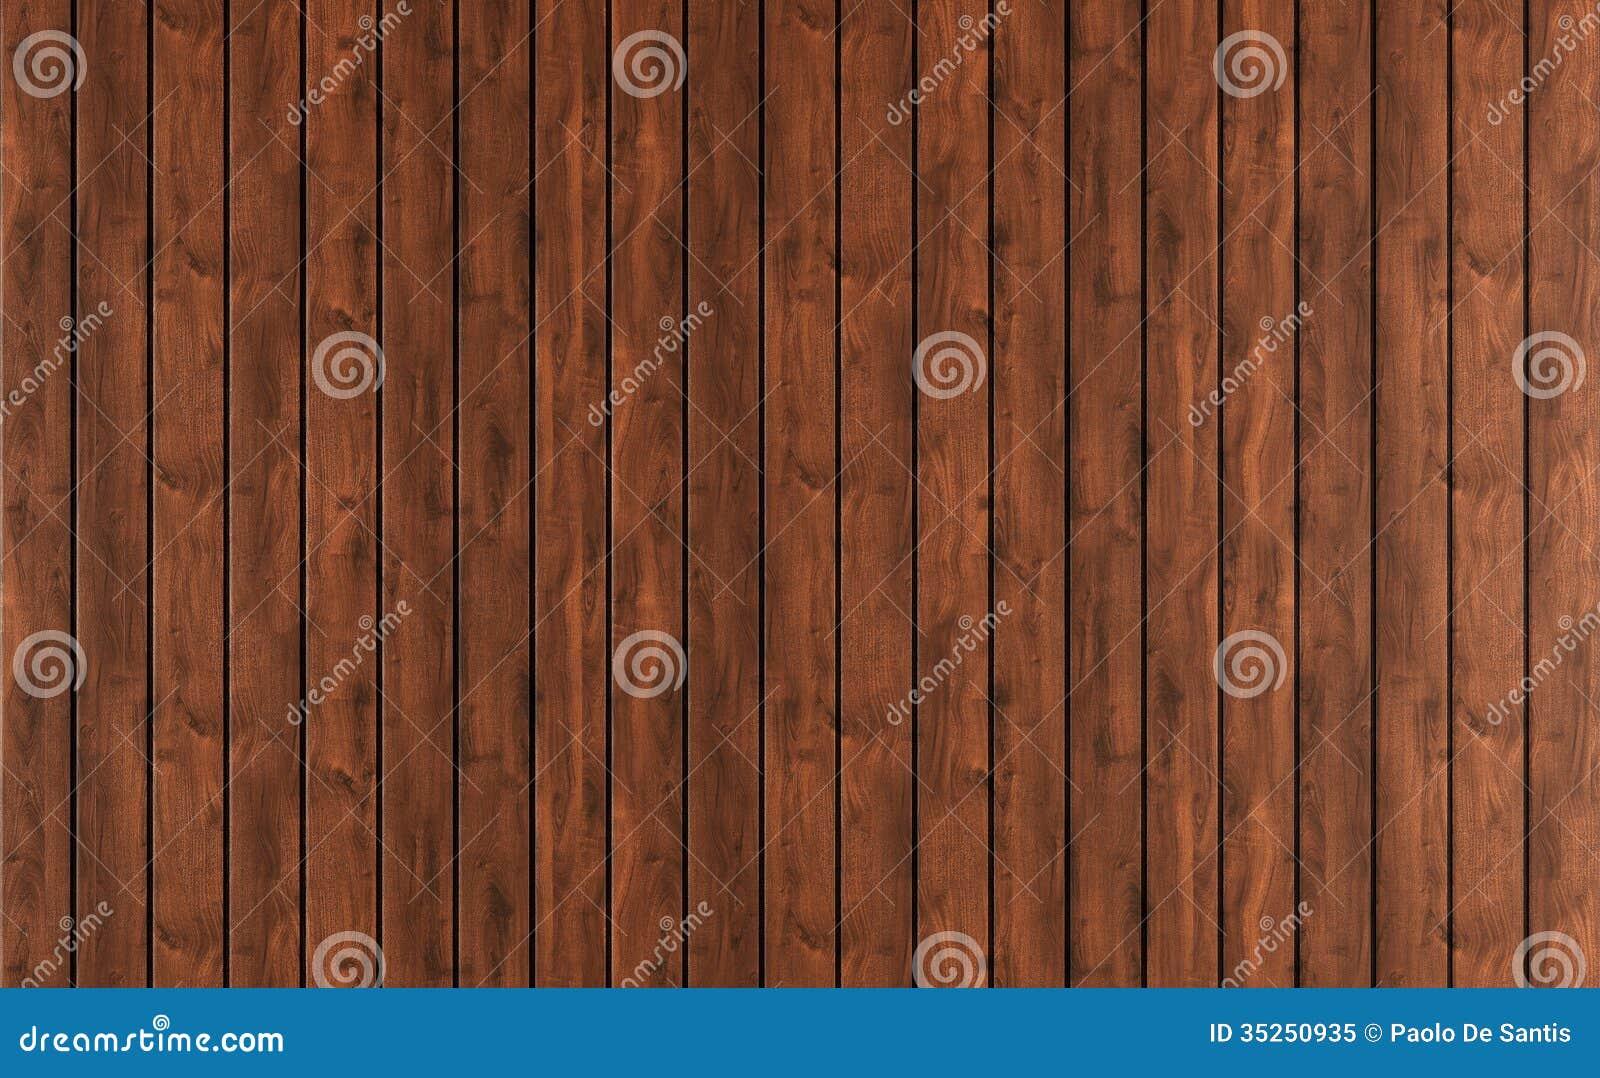 Dark Wood Paneling ~ Dark wood paneling stock illustration of